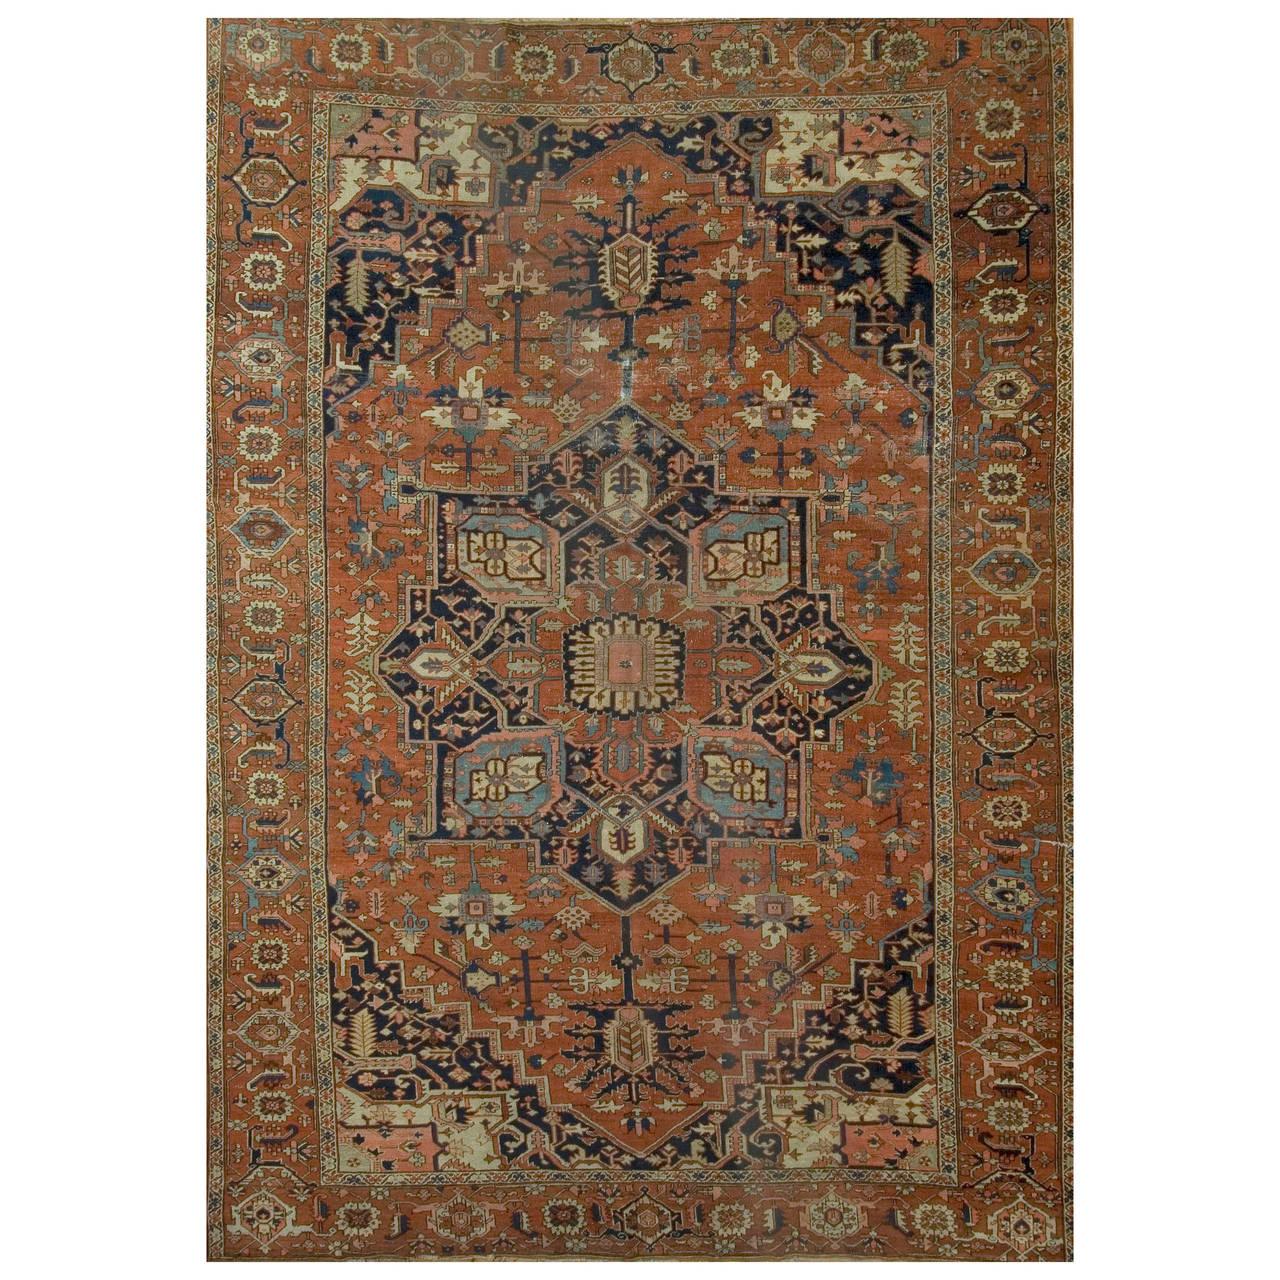 Vintage Persian Heriz Design Wool Area Rug: Antique Heriz Serapi Rug, Circa 1880 For Sale At 1stdibs